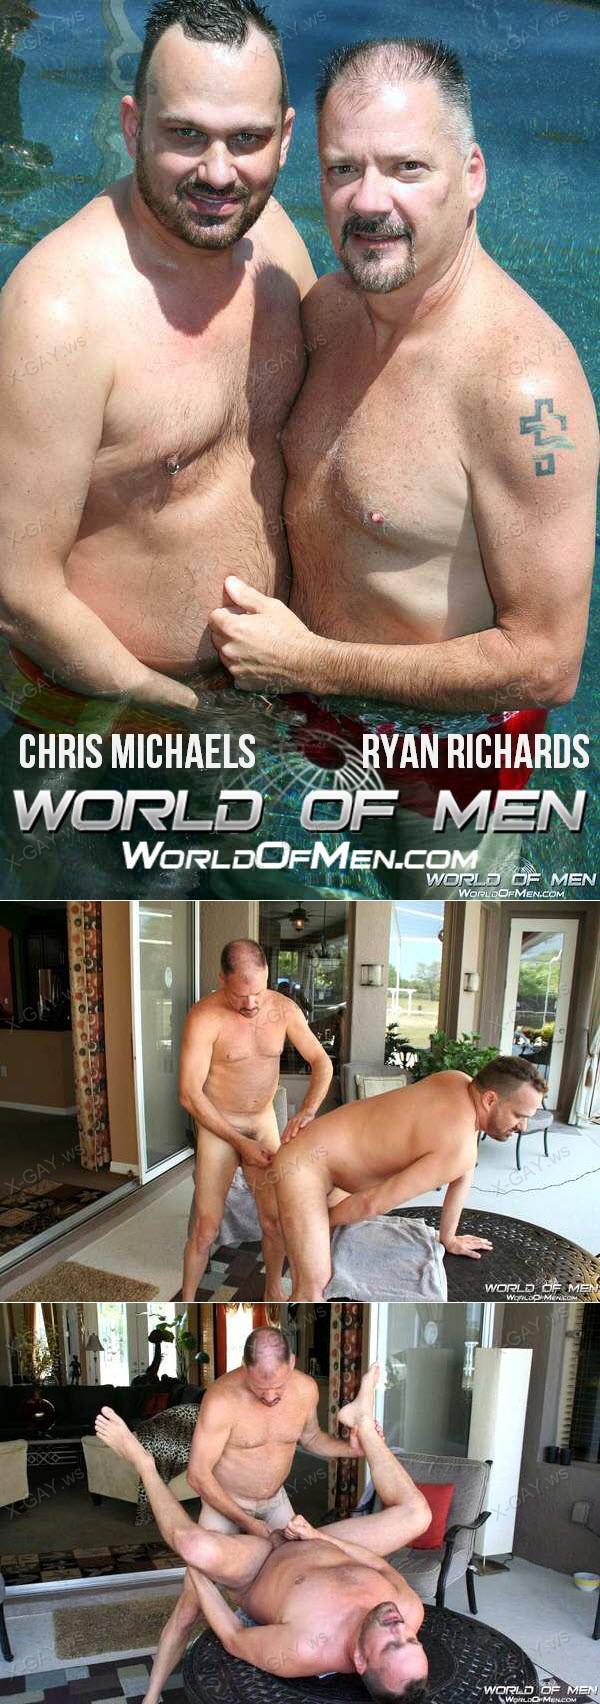 worldofmen_chrismichaels_ryanrichards.jpg